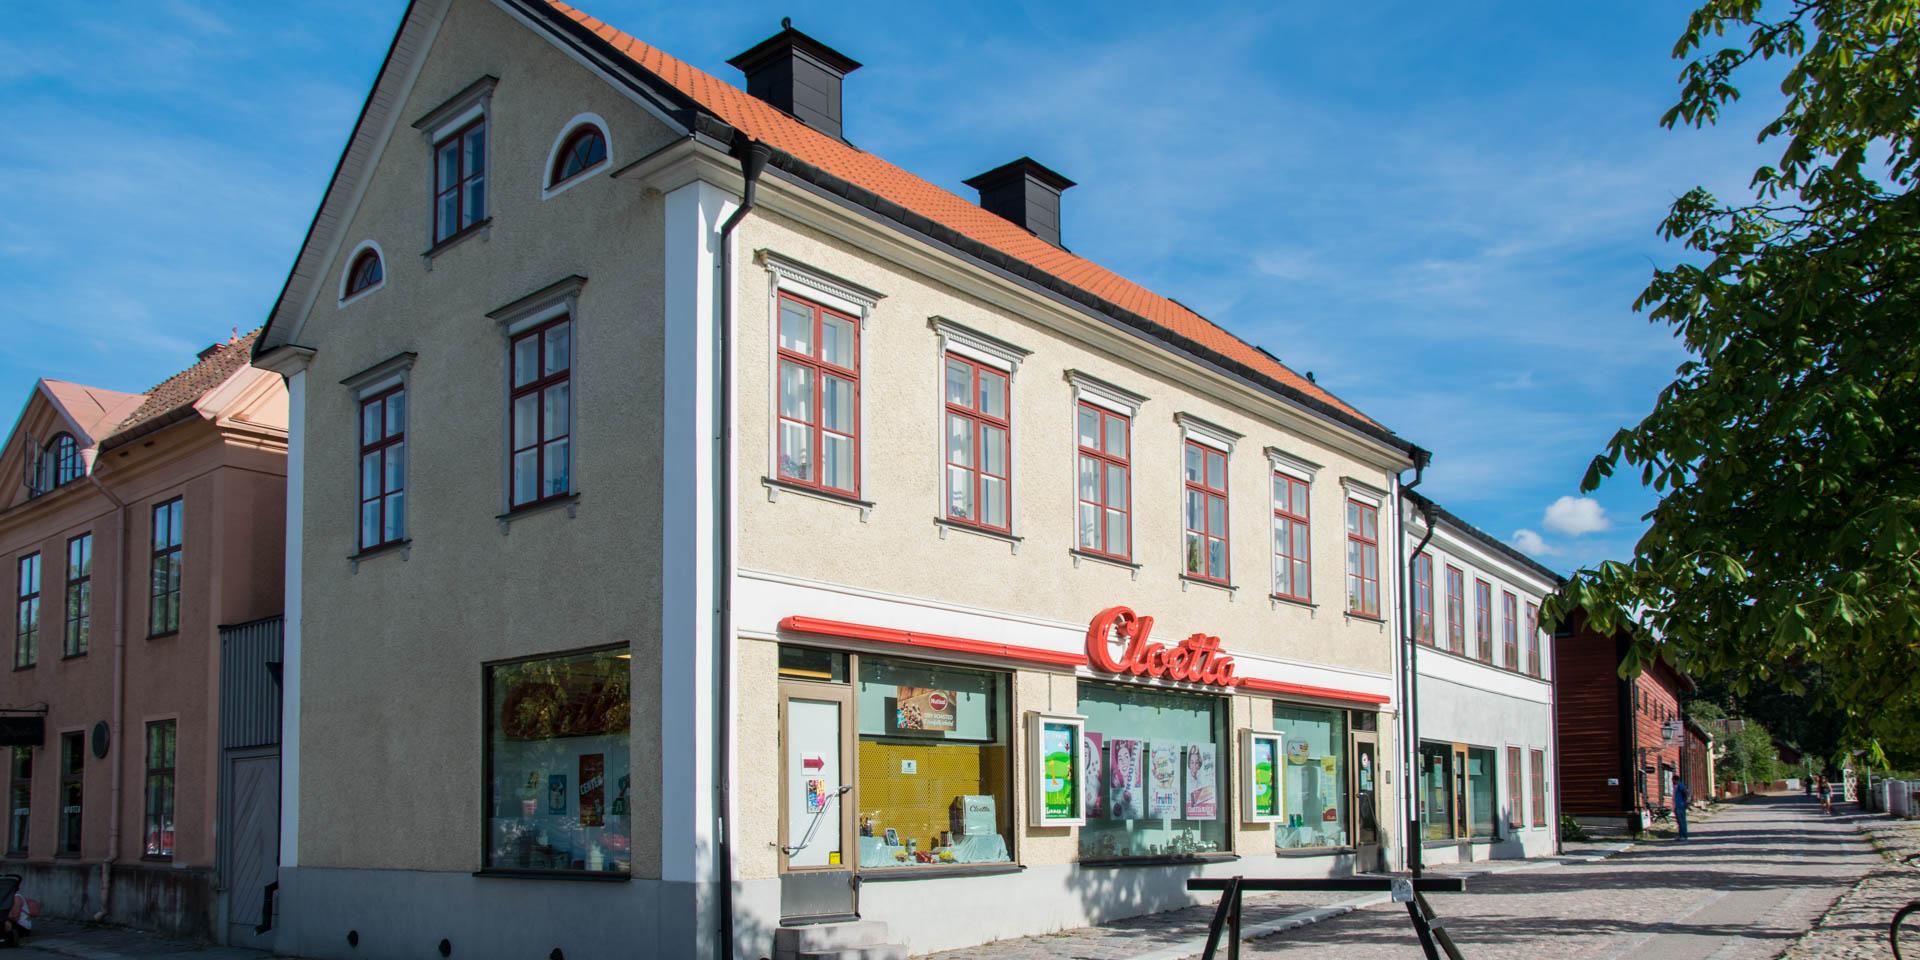 Cloettas Butik i Gamla Linköping 2018